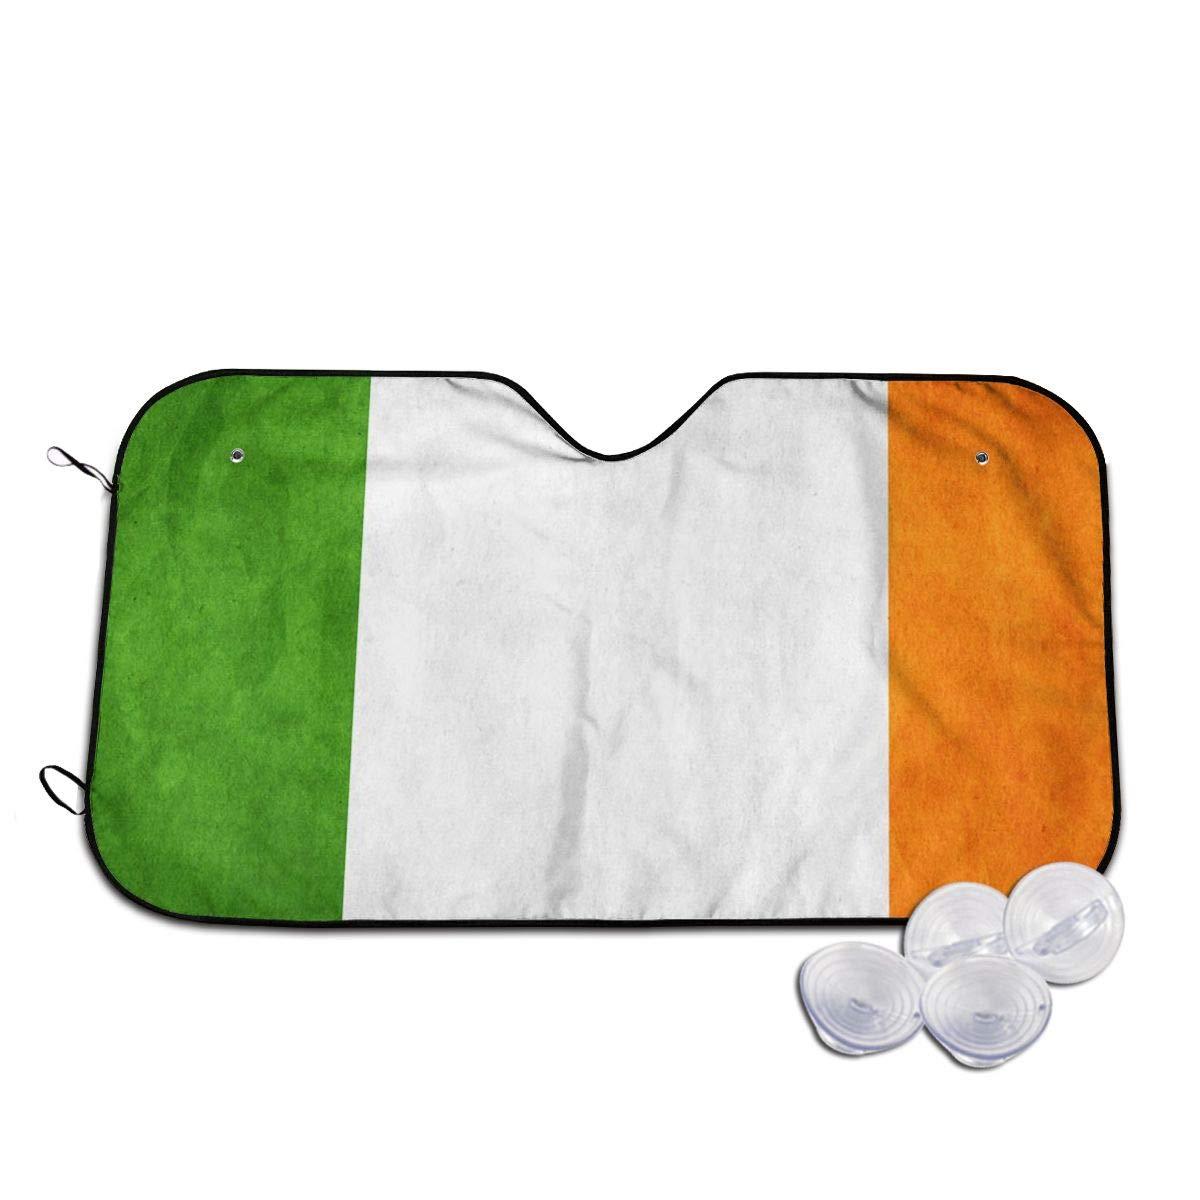 Ireland NEW Grunge Flag Windshields Sun Lastin 3D Printed Long Gifts Shade